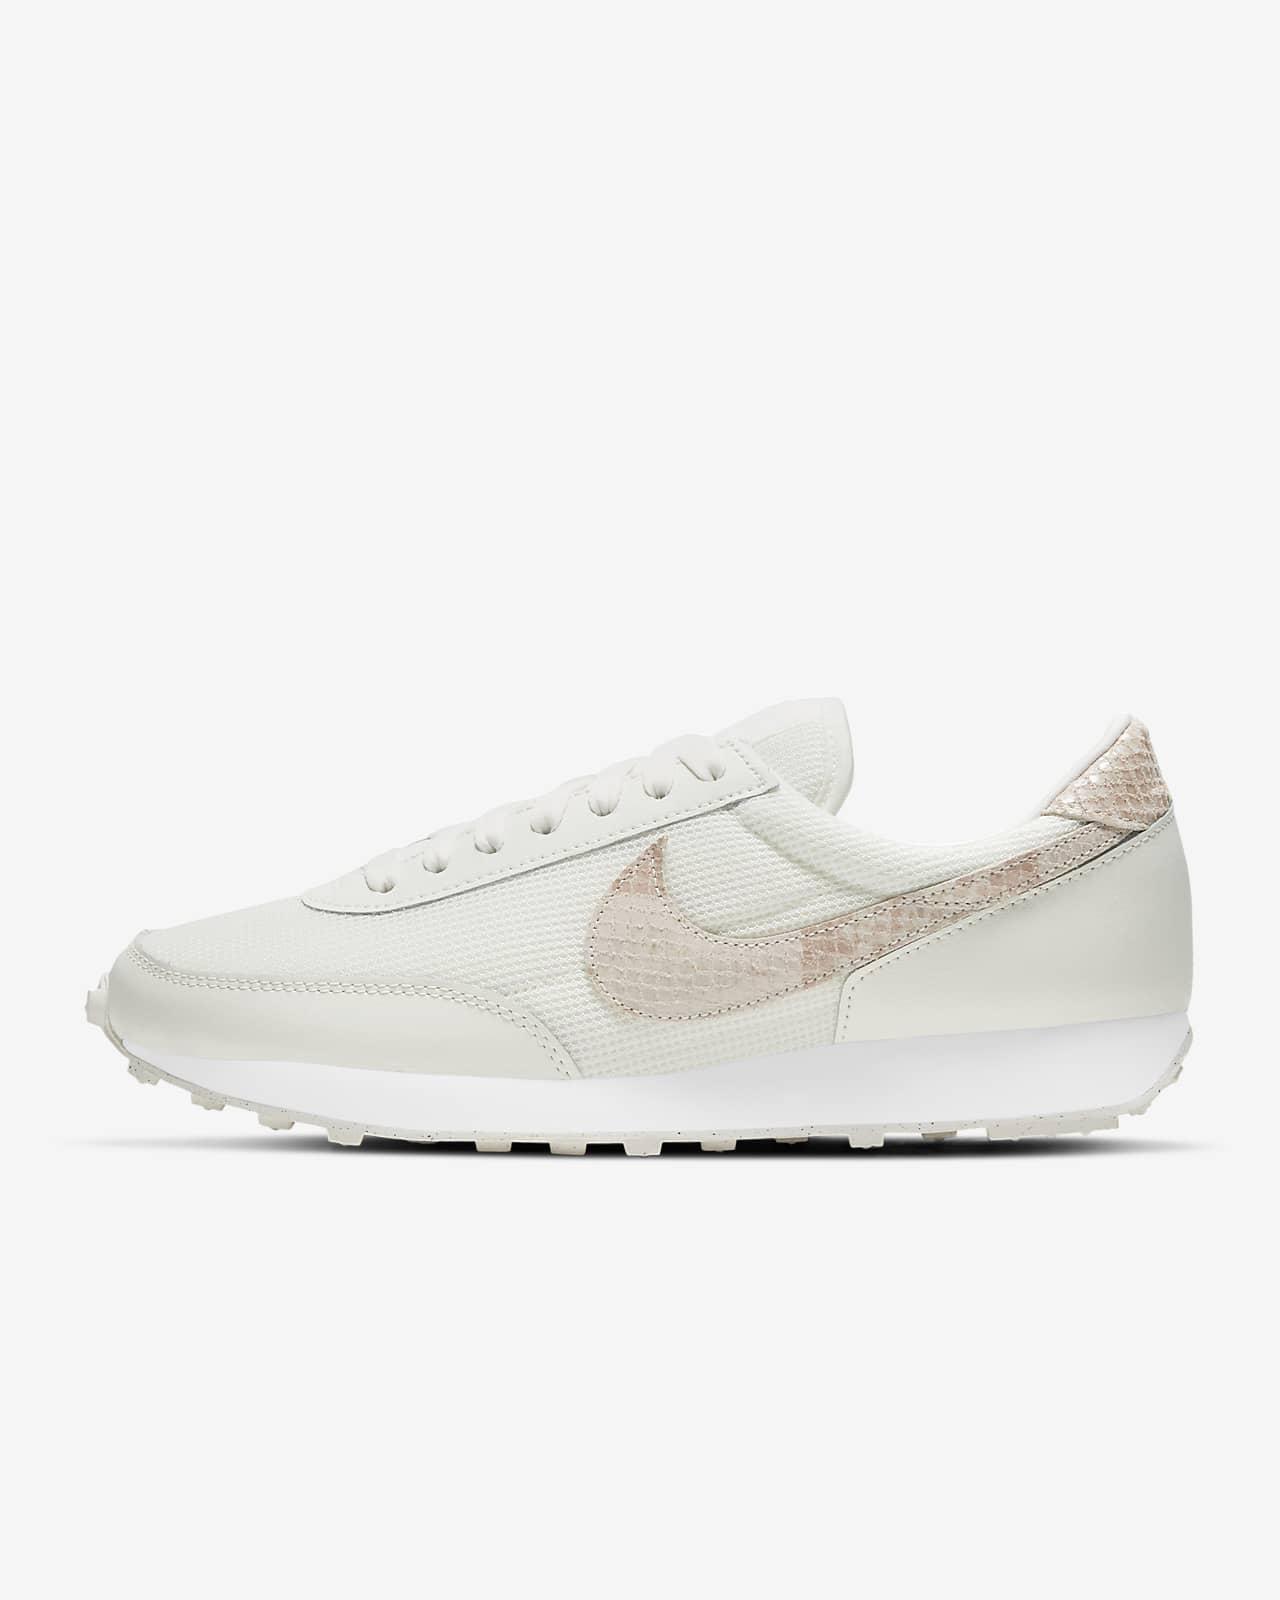 Nike DBreak Damenschuh